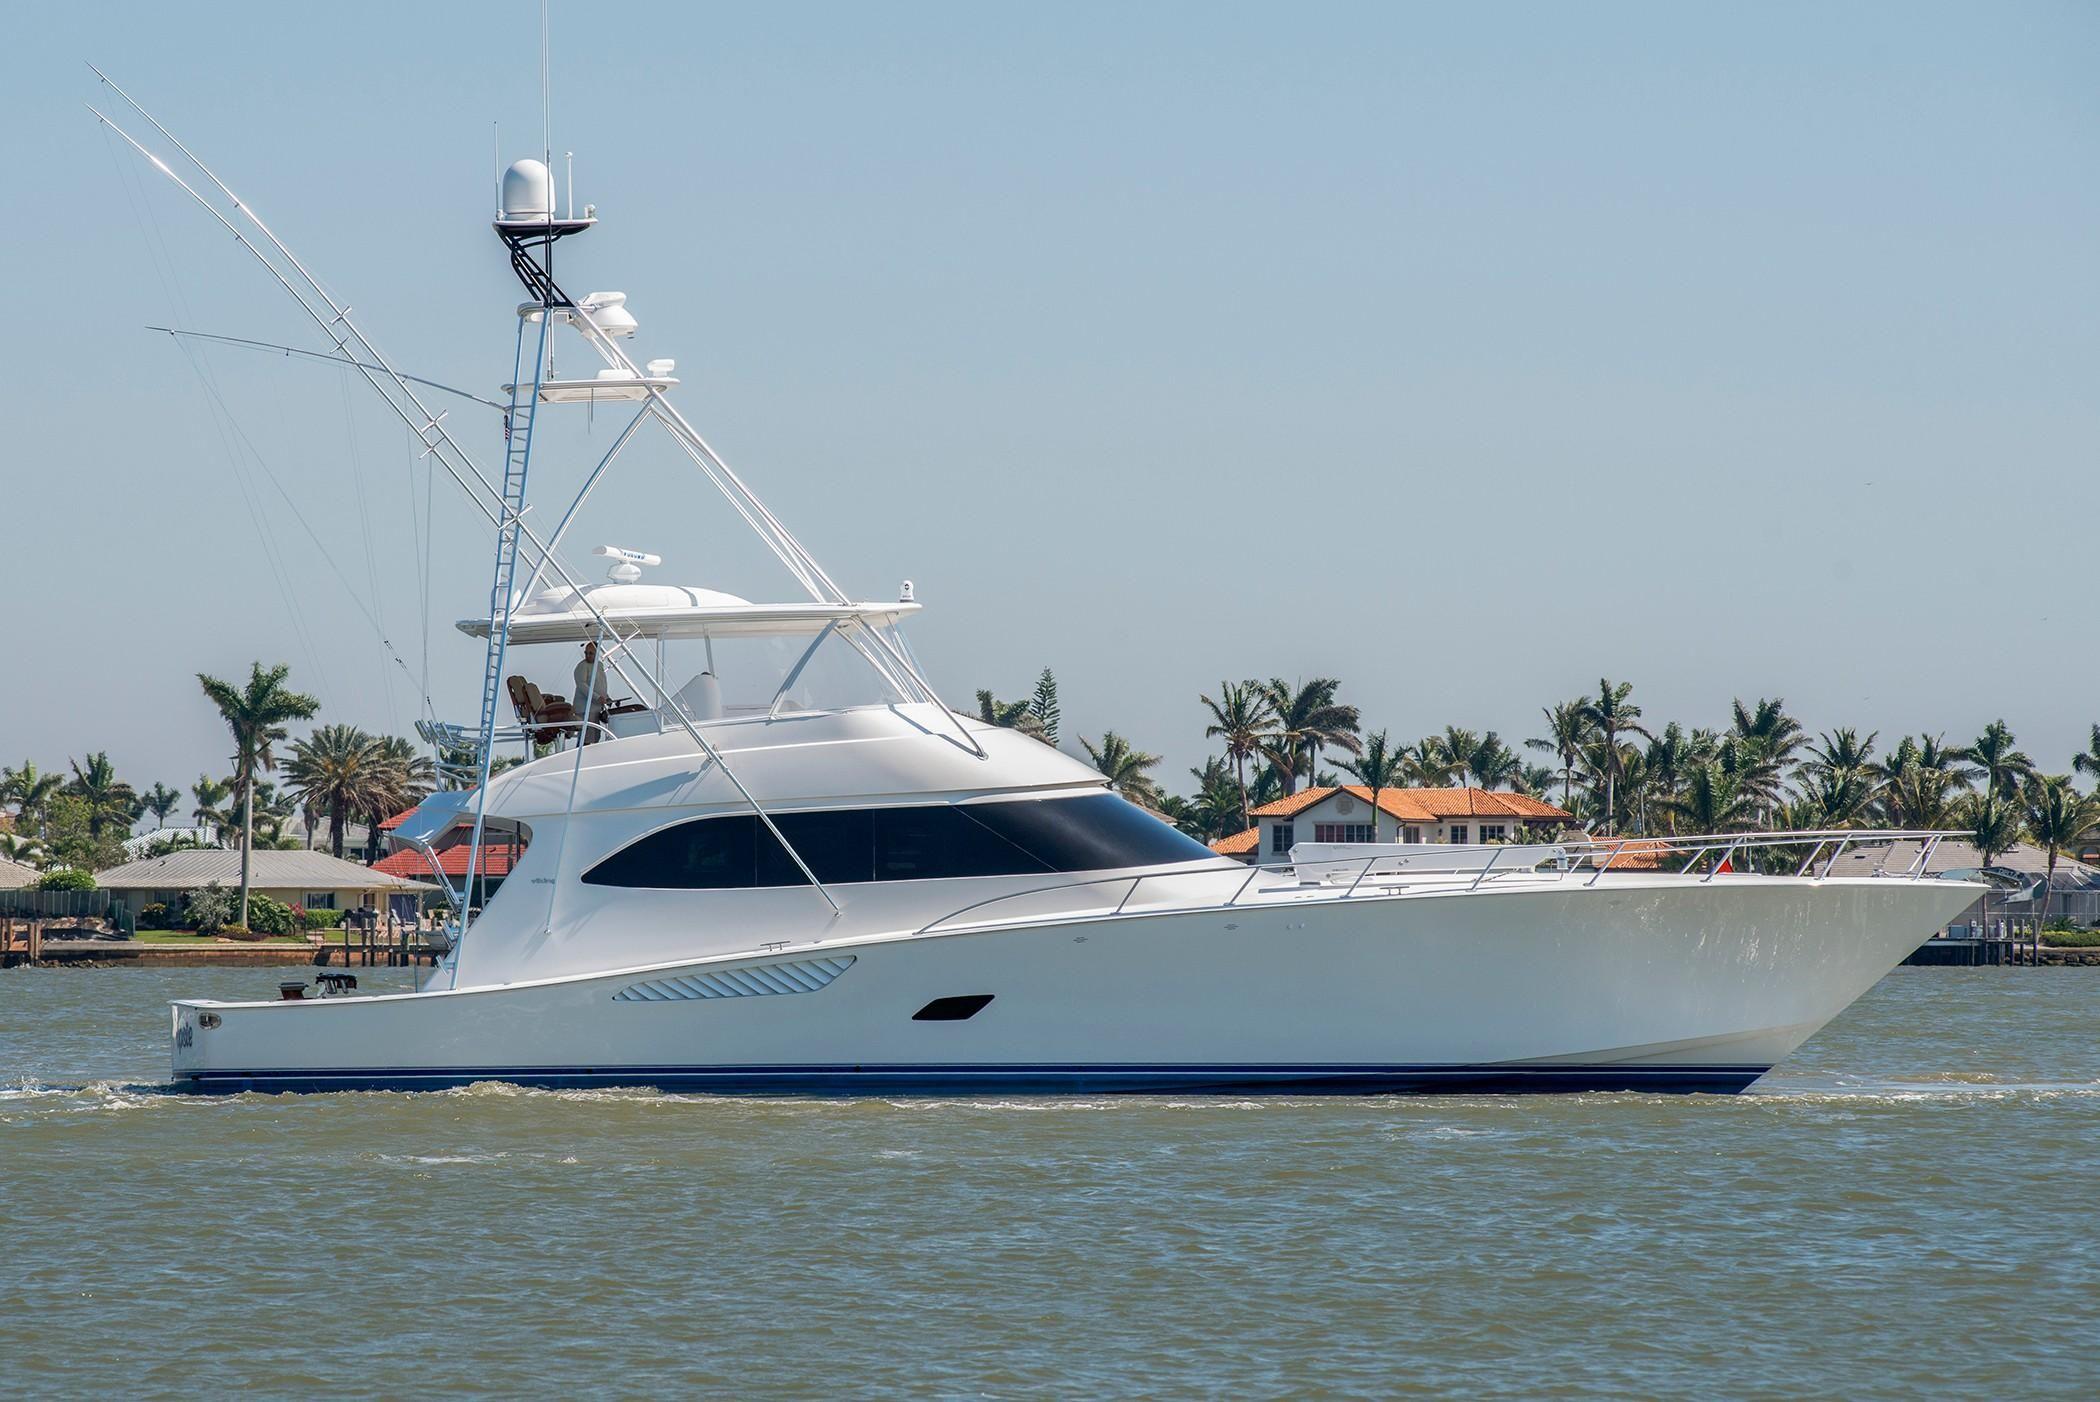 2013 viking 76 sportfish power boat for sale www for Viking sport fish